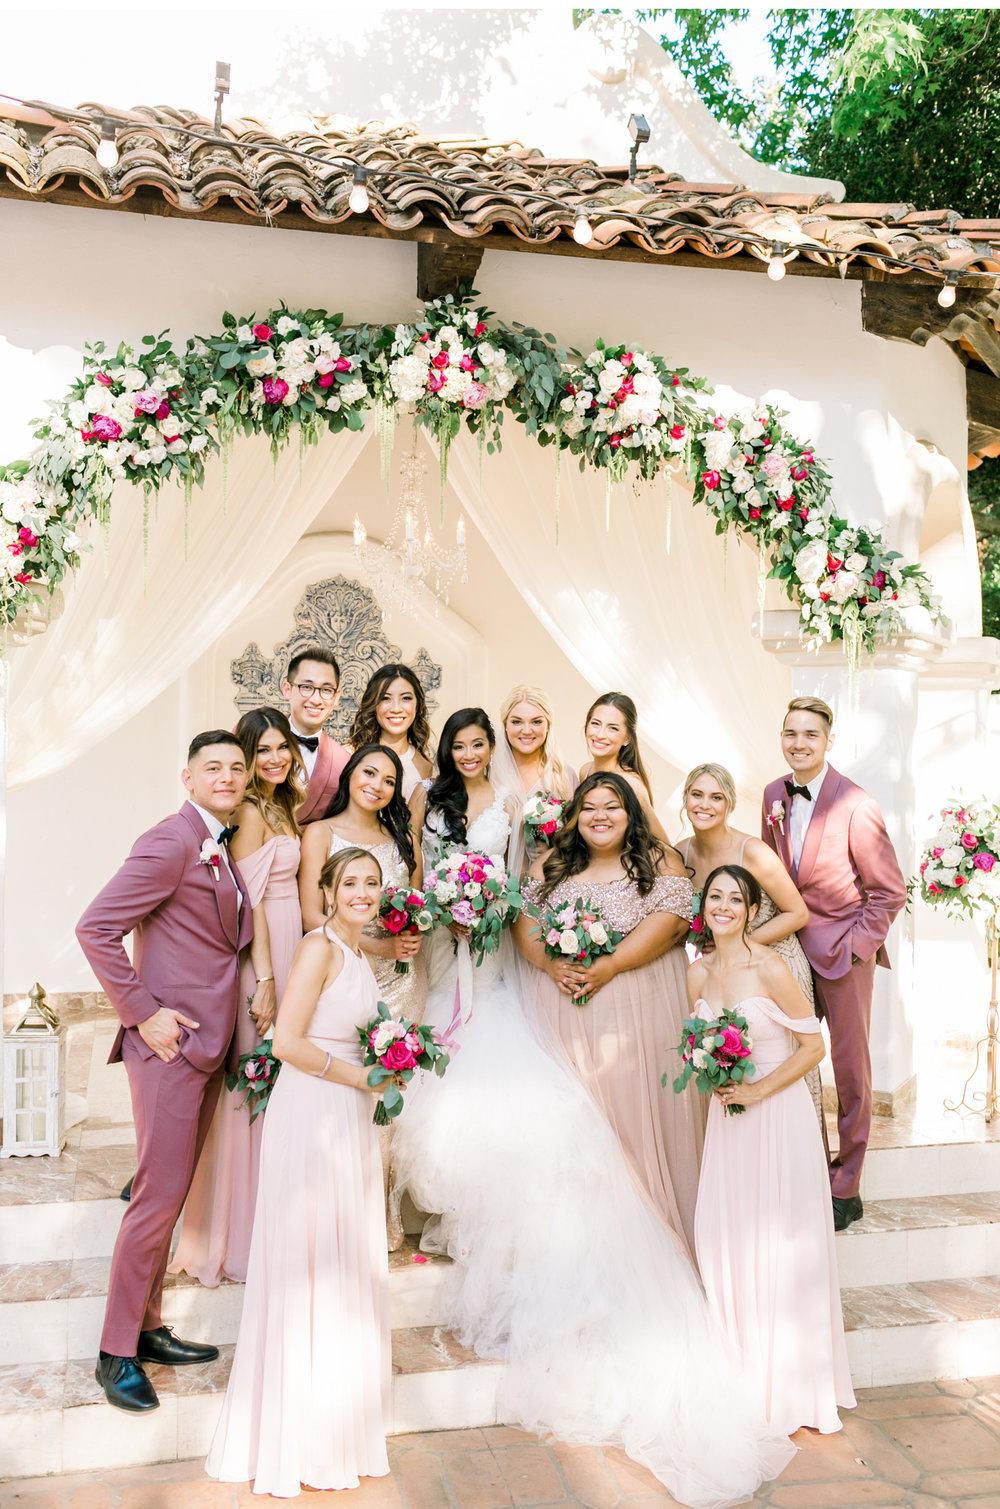 Rancho-Las-Lomas-Style-Me-Pretty-Wedding-Natalie-Schutt-Photography_05.jpg